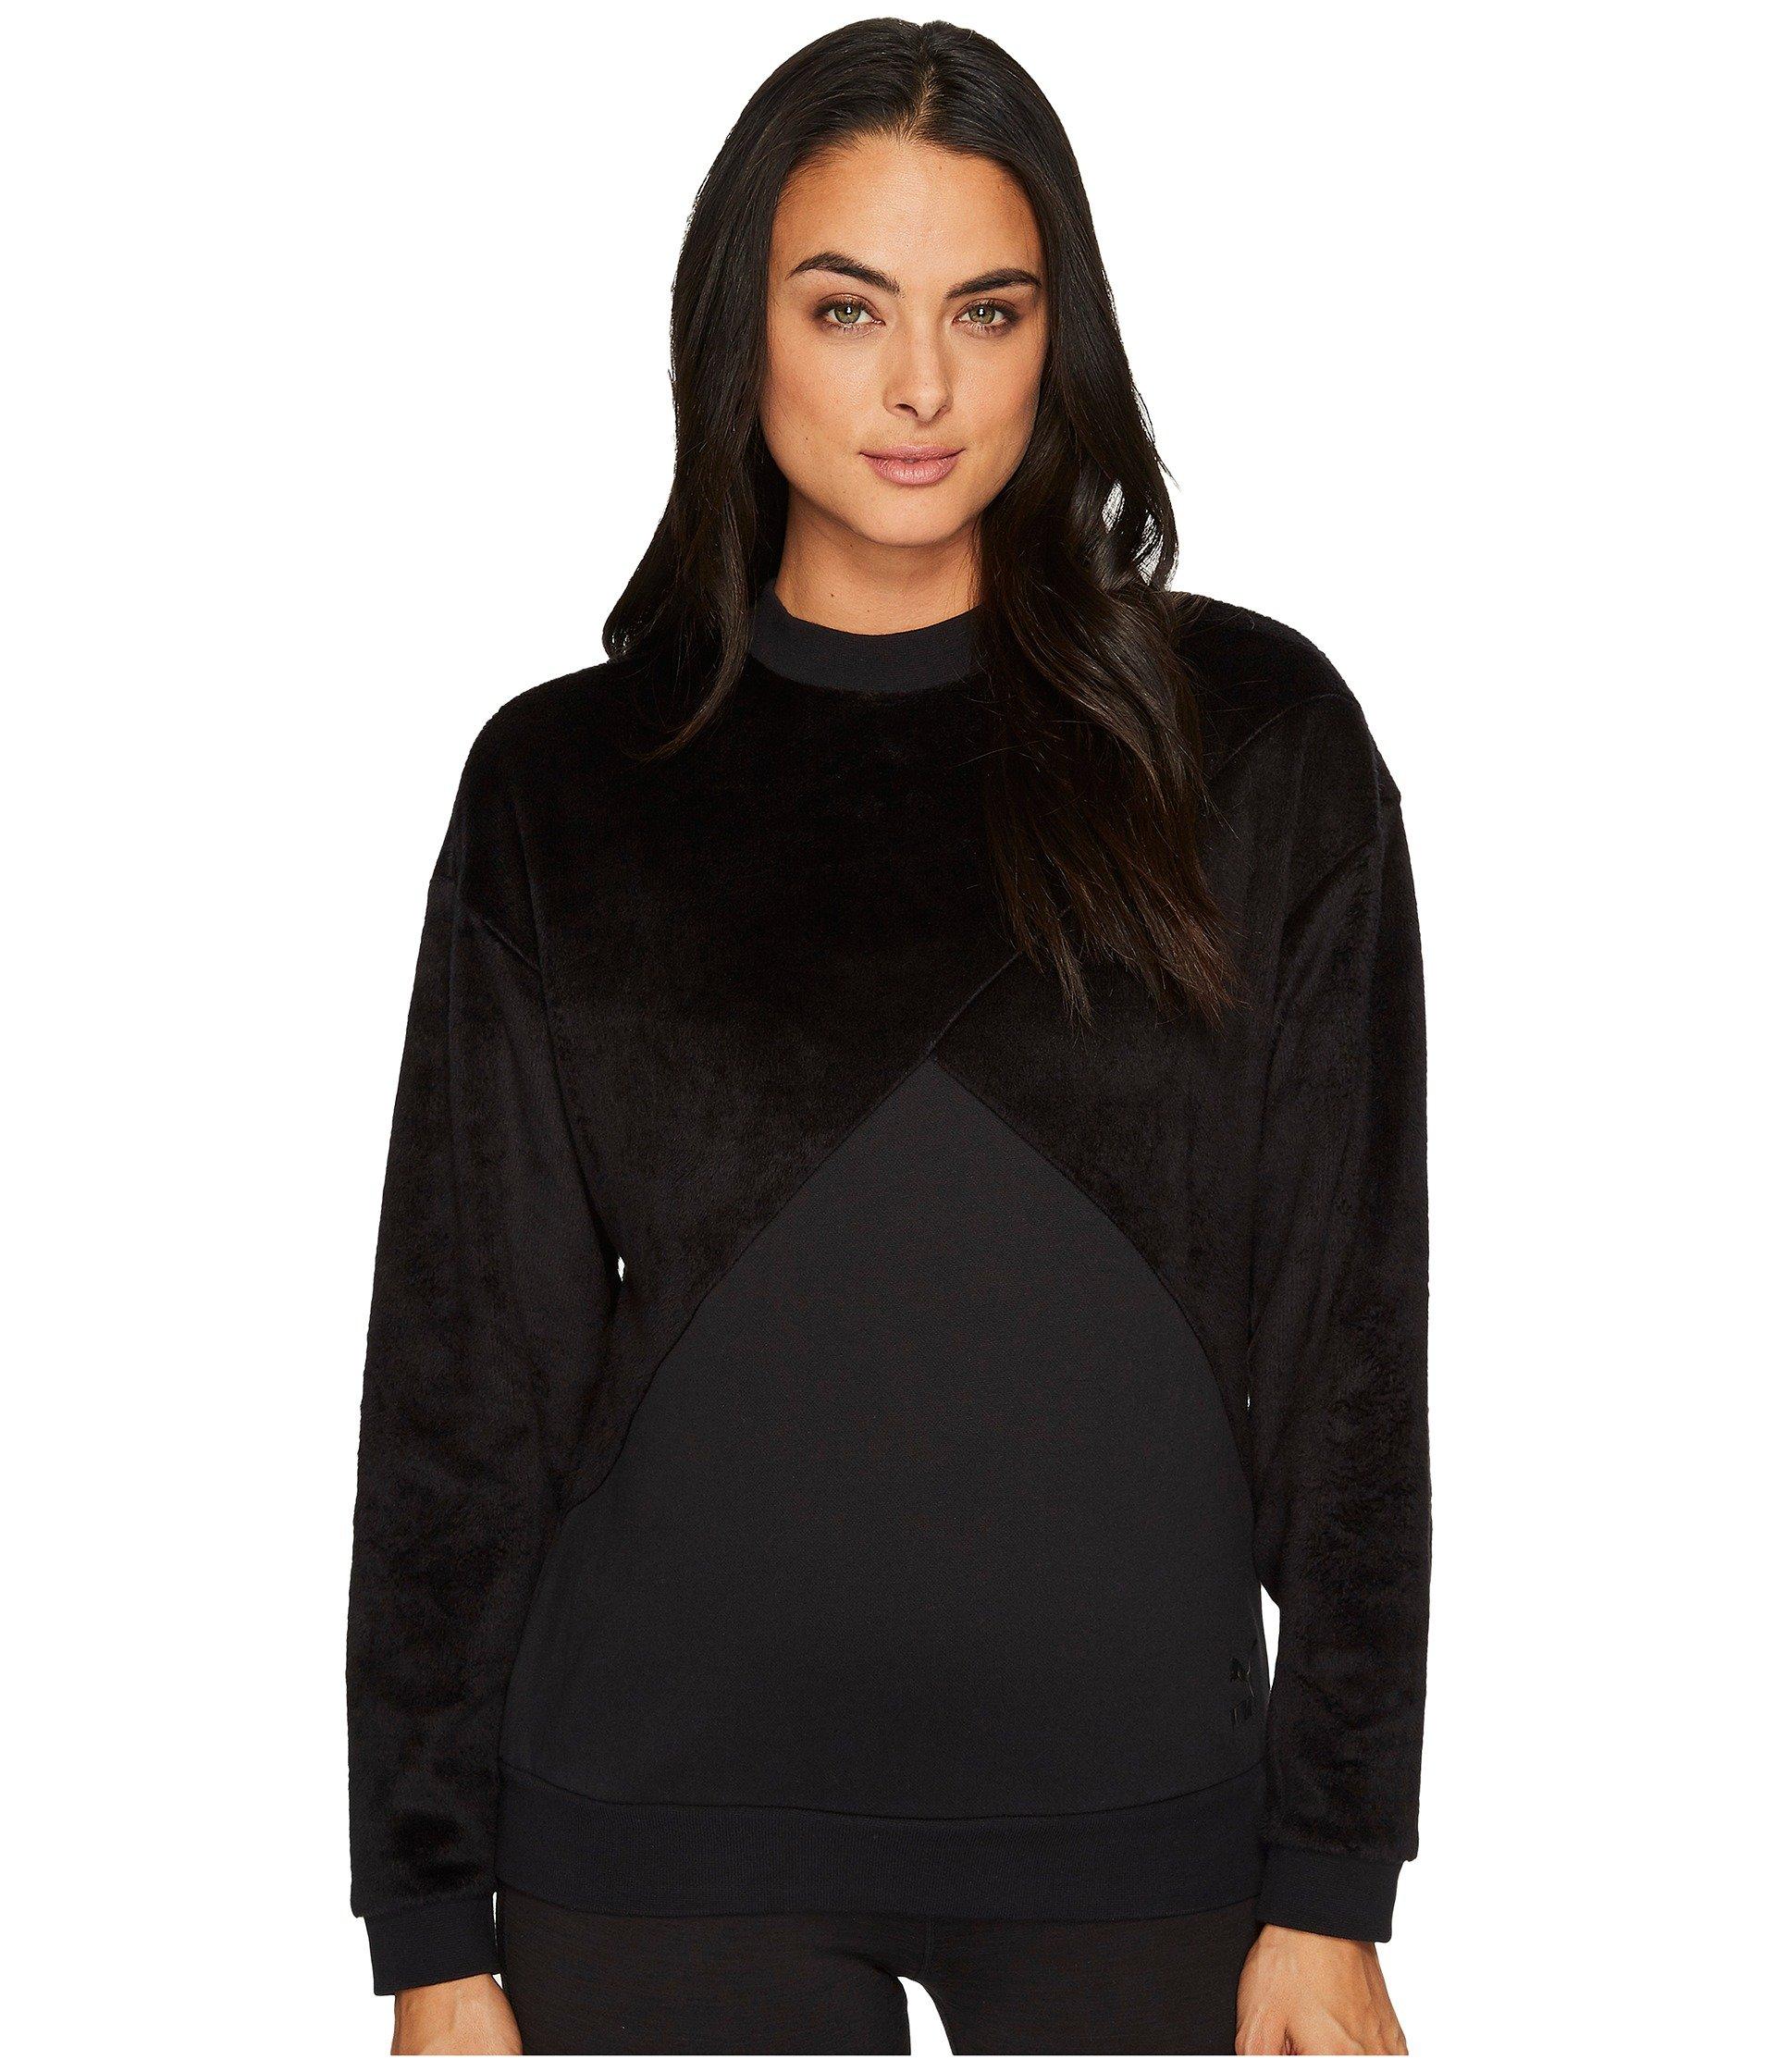 Fabric Block Crew Sweatshirt